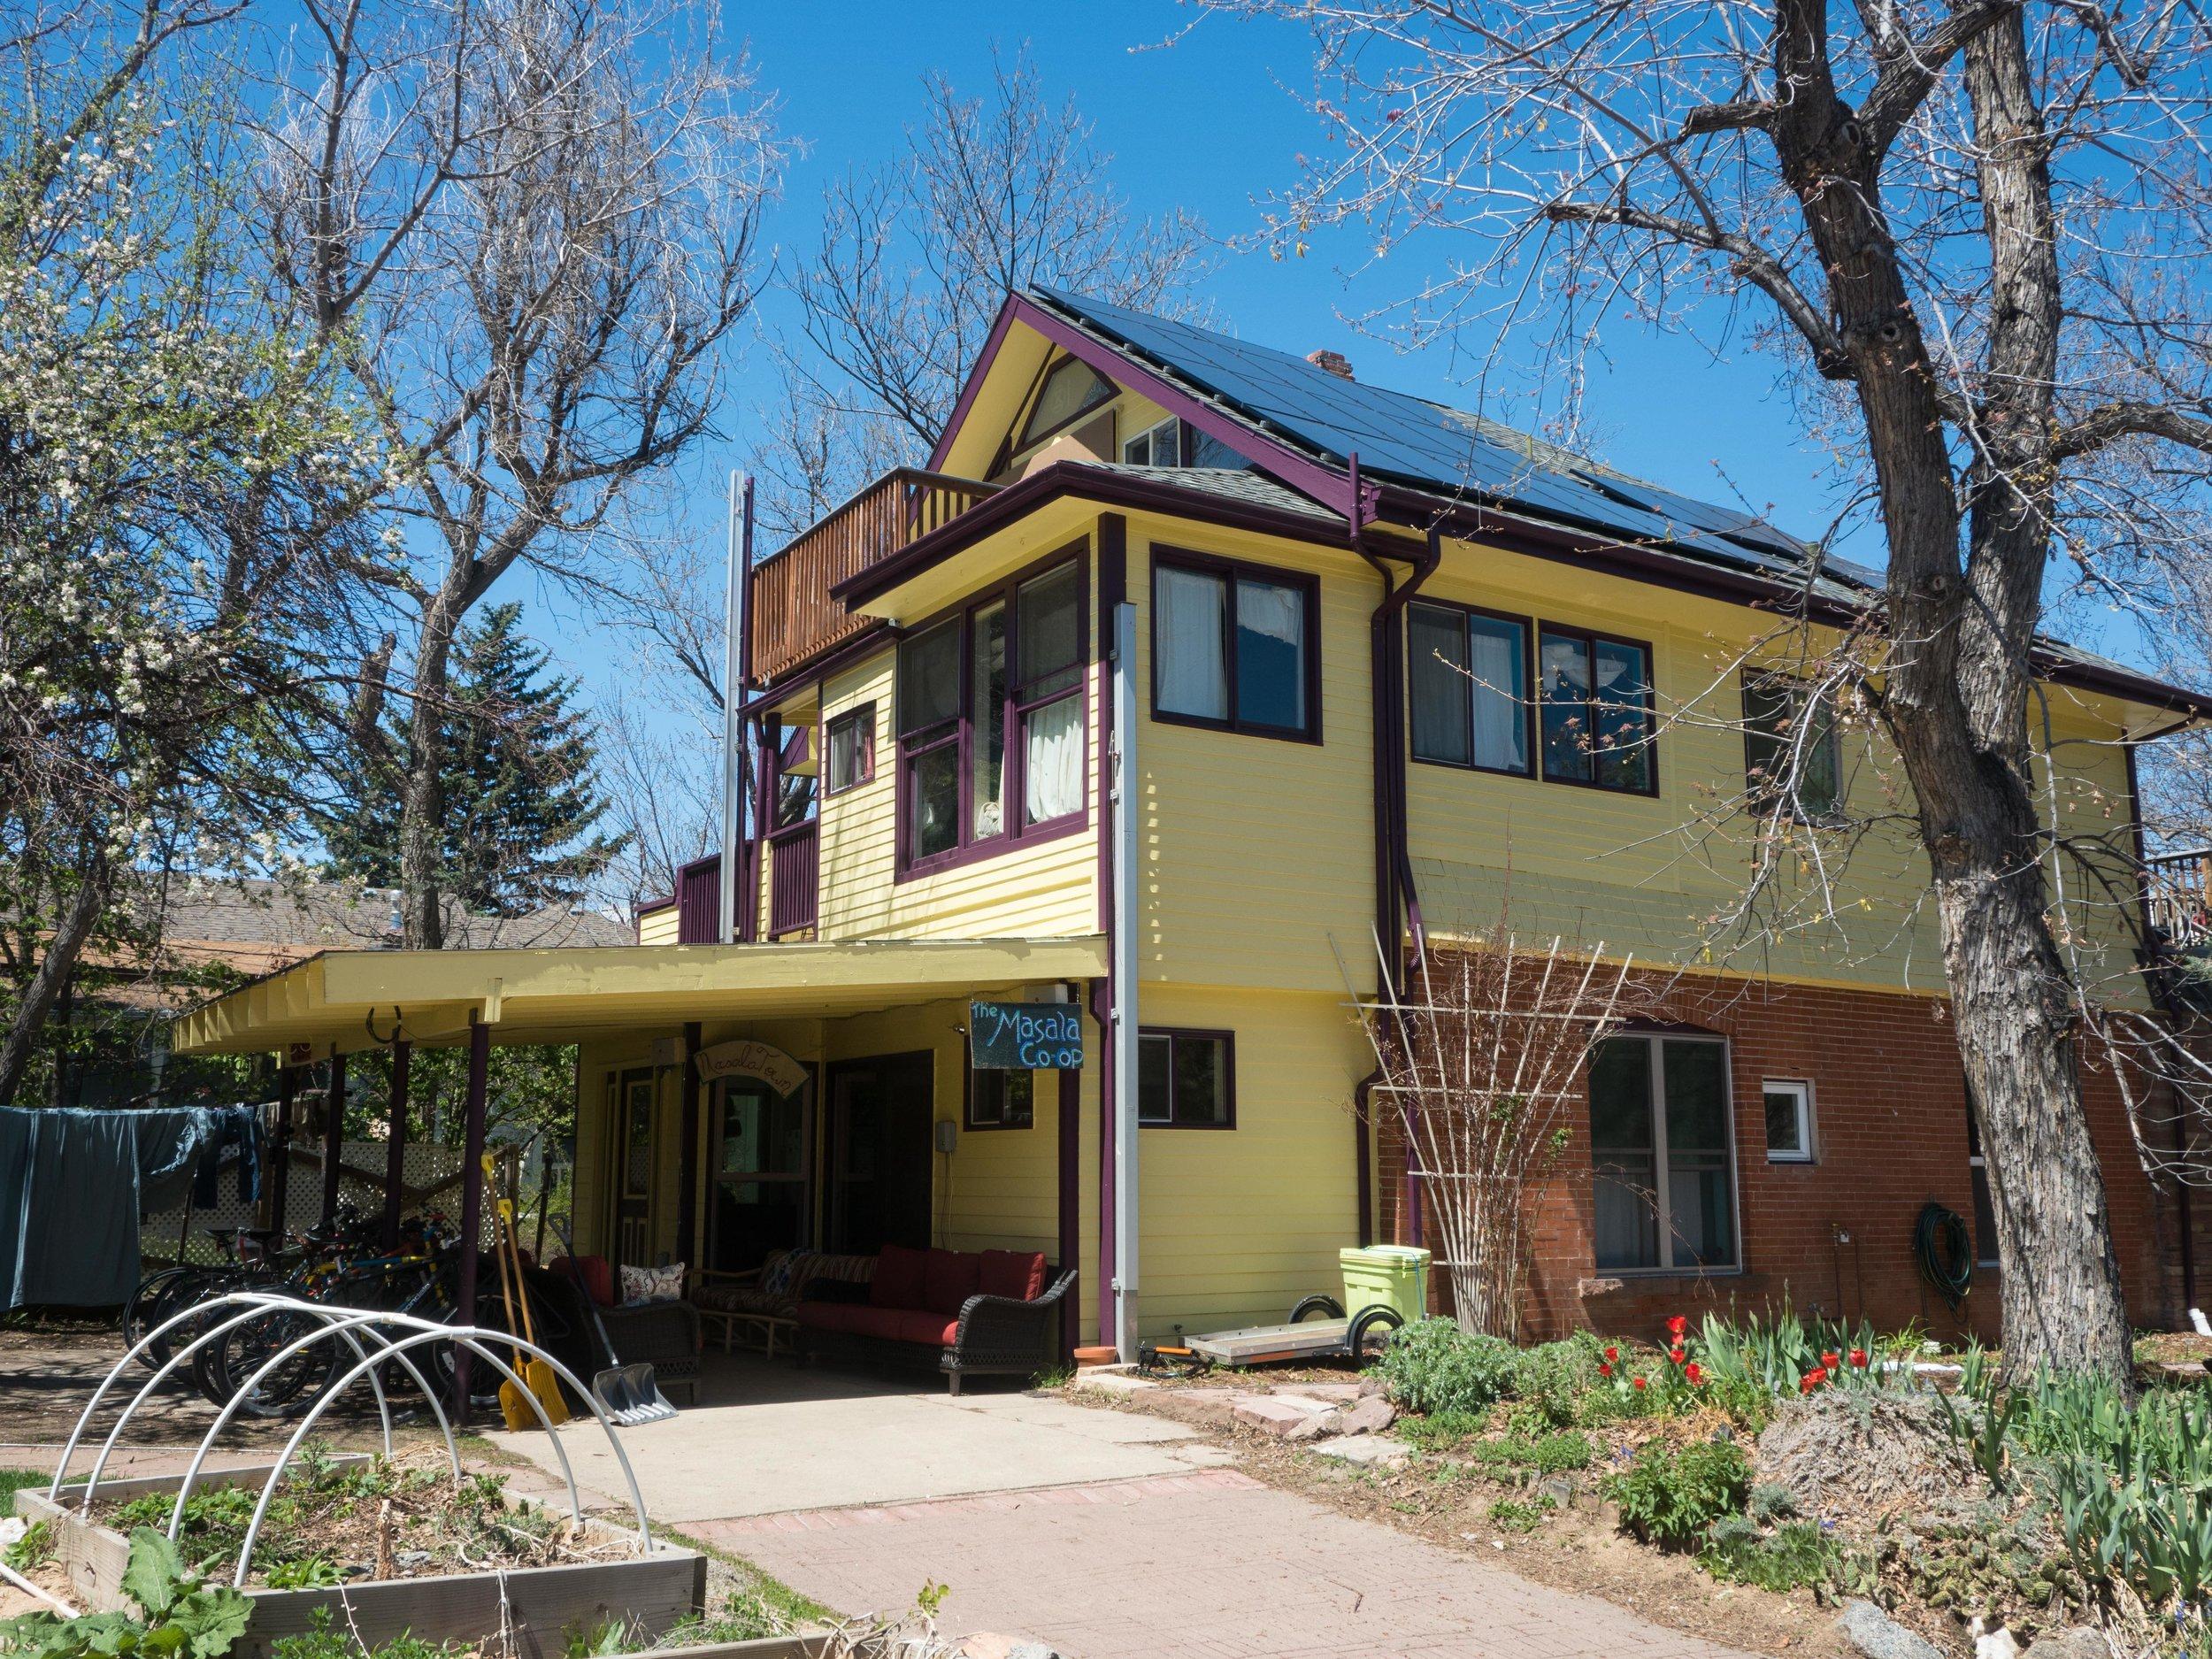 Masala Cooperative. Credit: Boulder Housing Coalition